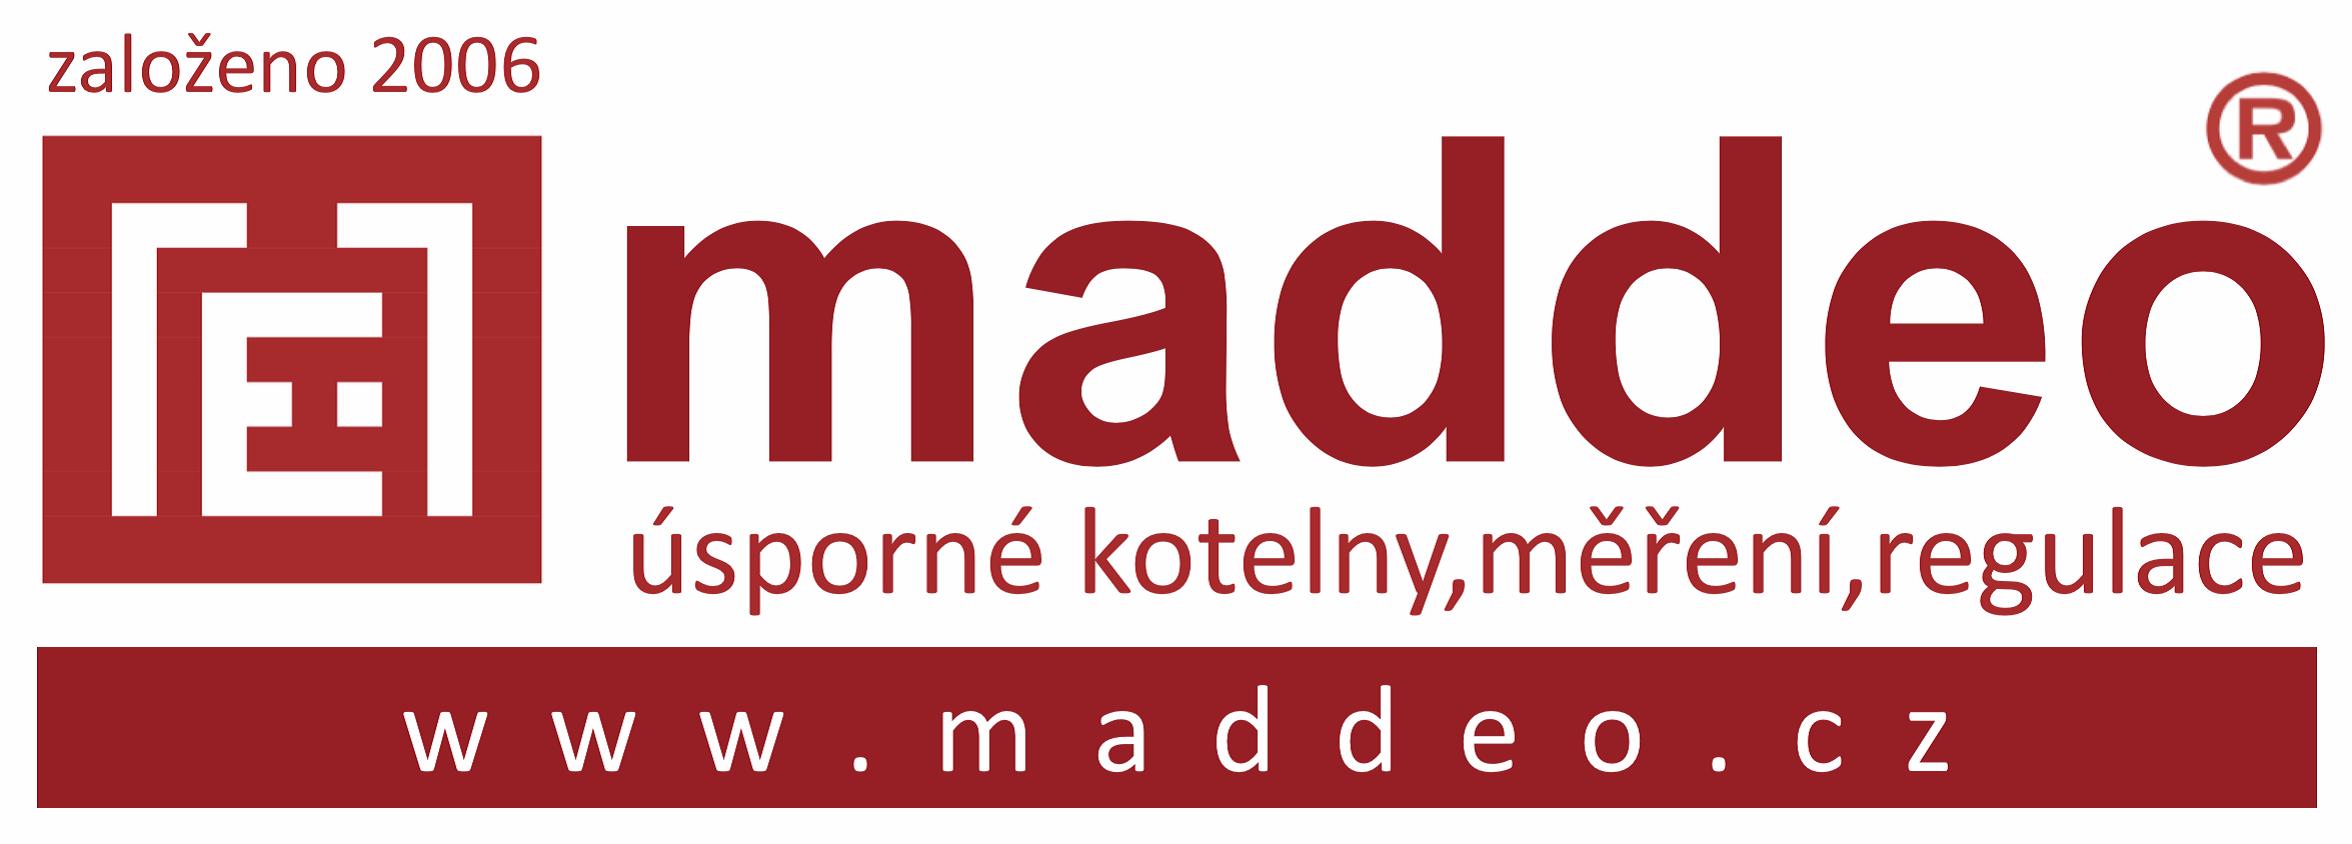 logo_maddeo